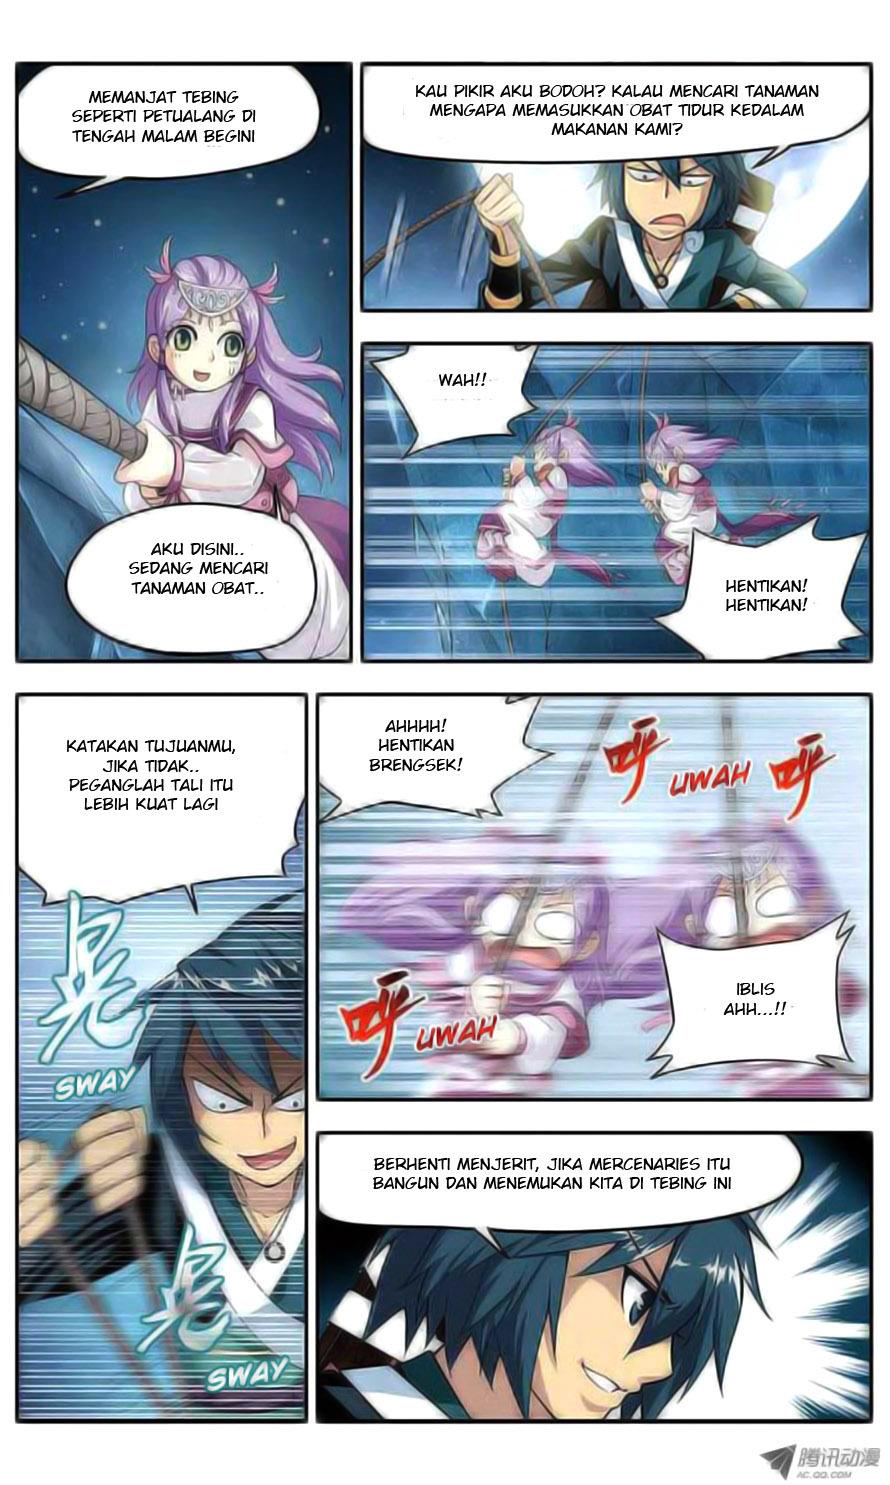 Dilarang COPAS - situs resmi www.mangacanblog.com - Komik battle through heaven 022 - chapter 22 23 Indonesia battle through heaven 022 - chapter 22 Terbaru 14|Baca Manga Komik Indonesia|Mangacan